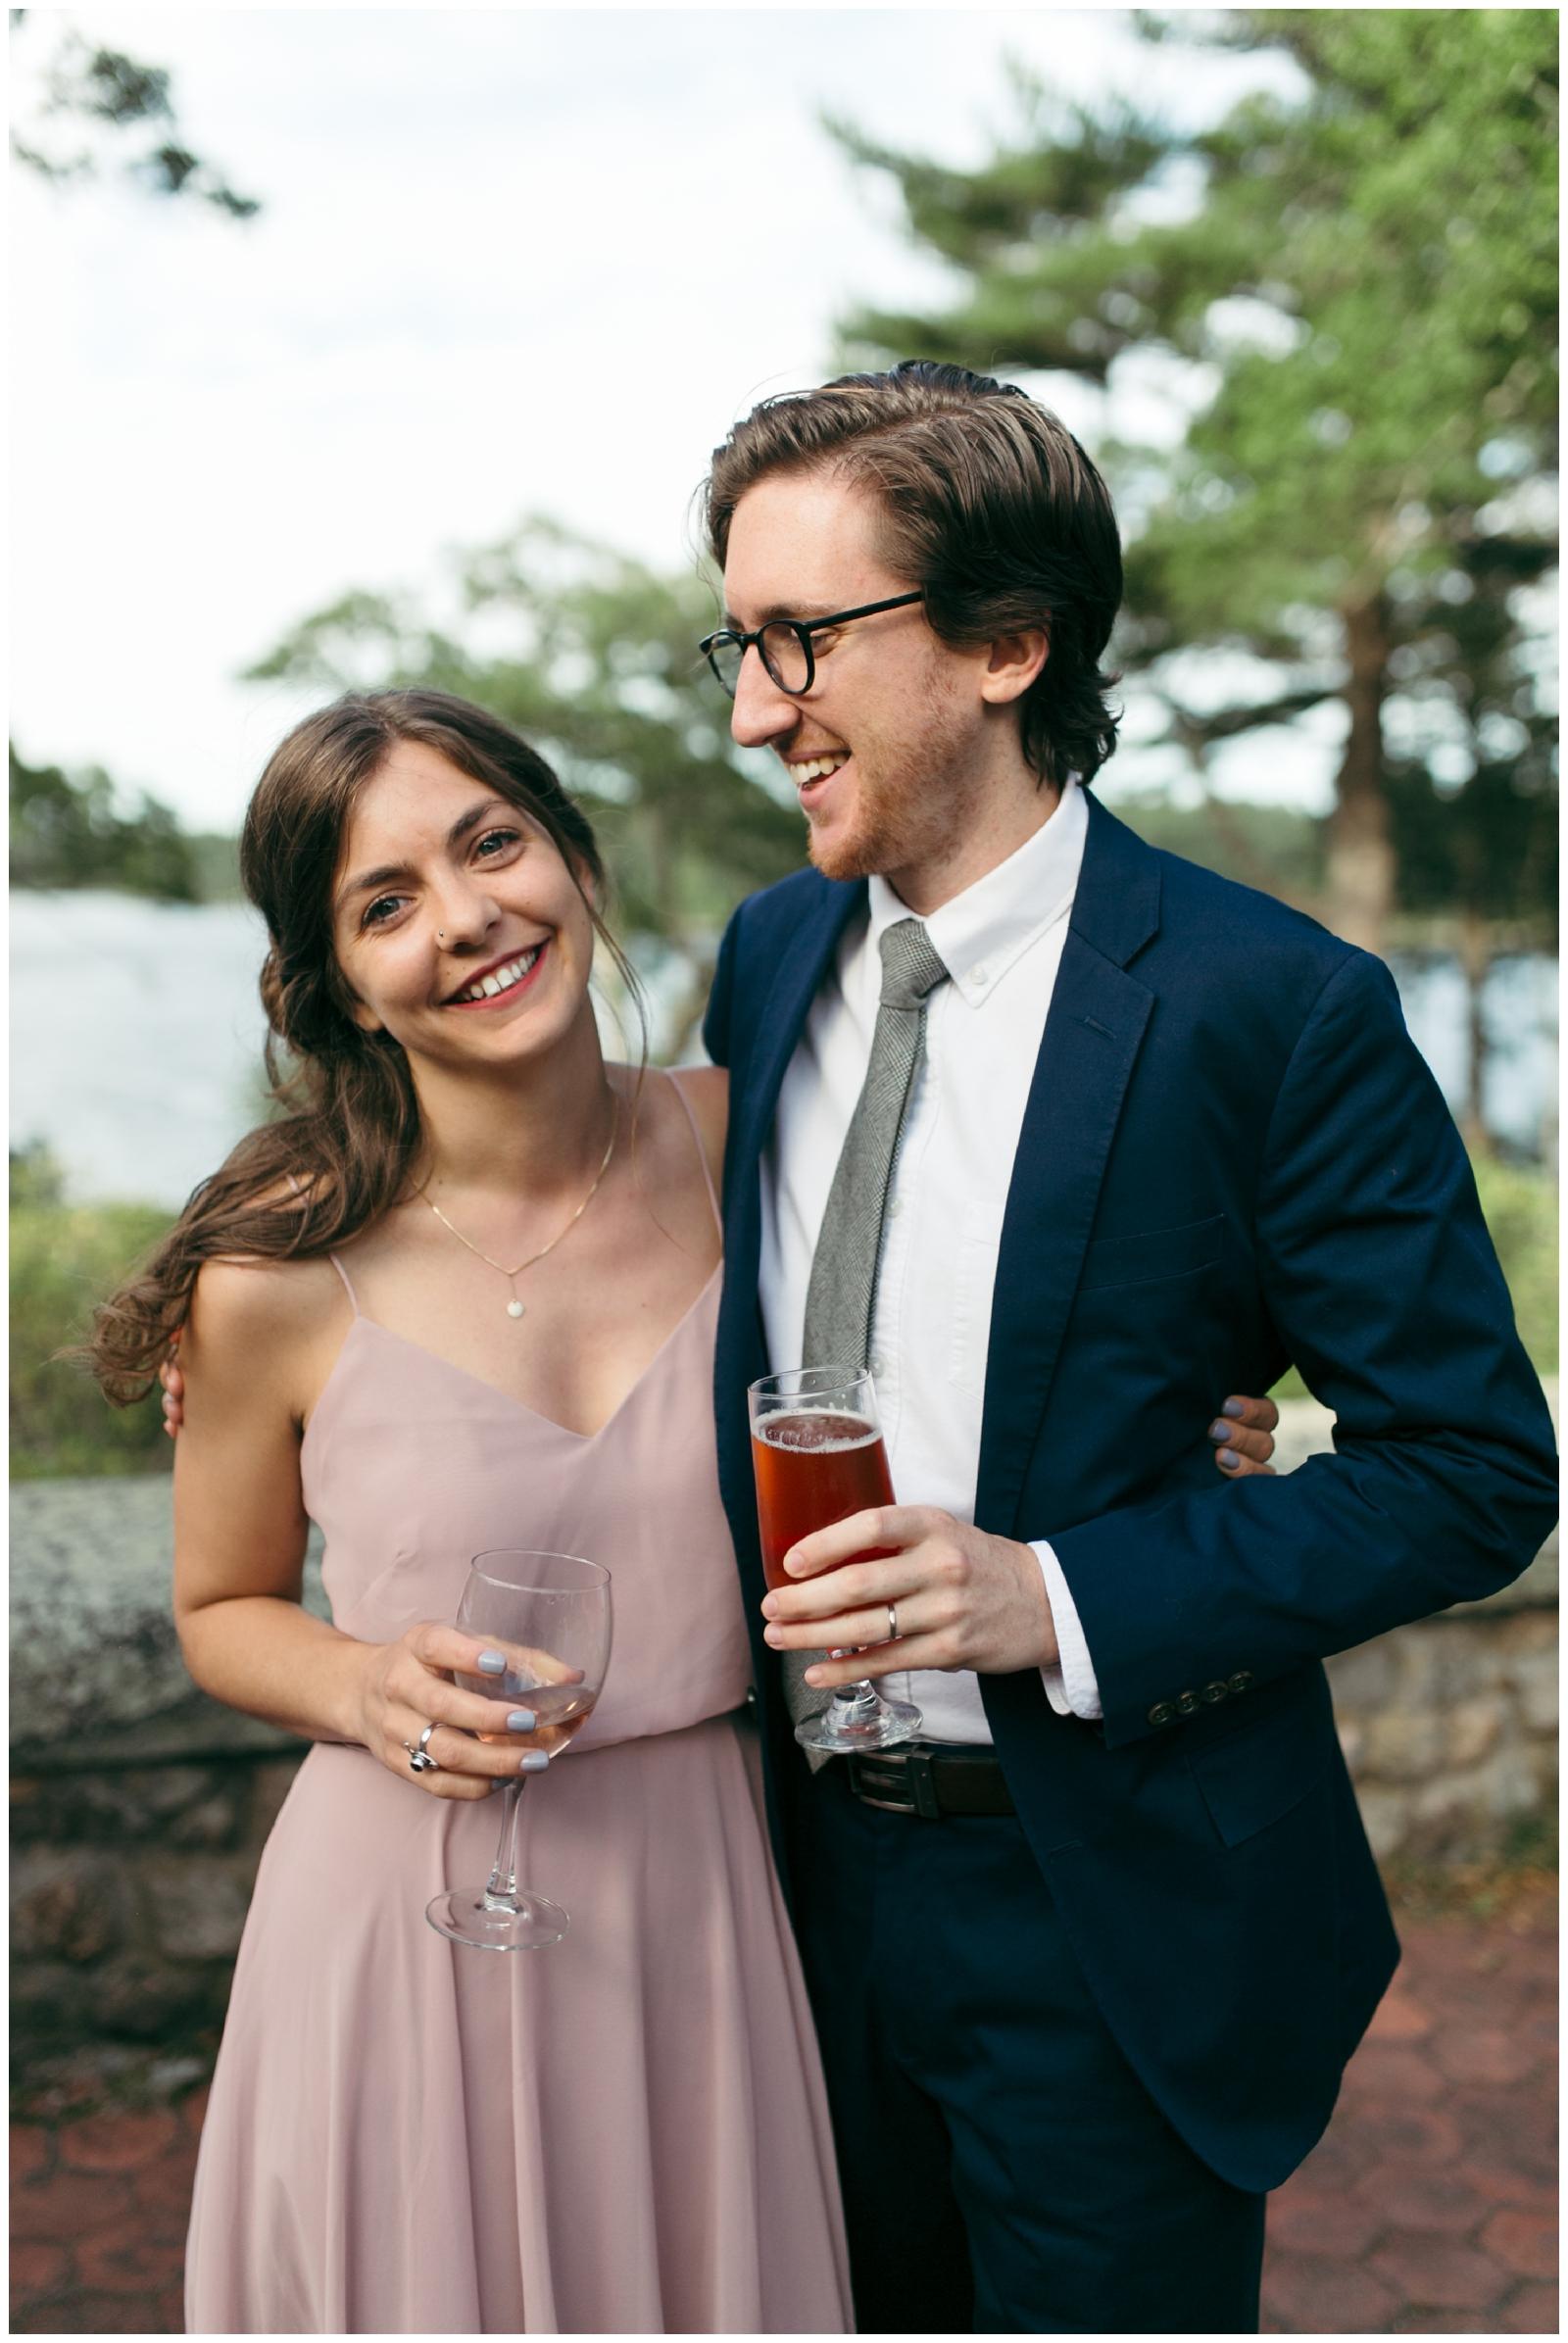 Moraine-Farm-wedding-Bailey-Q-Photo-Massachusetts-wedding-photpgrapher-090.jpg